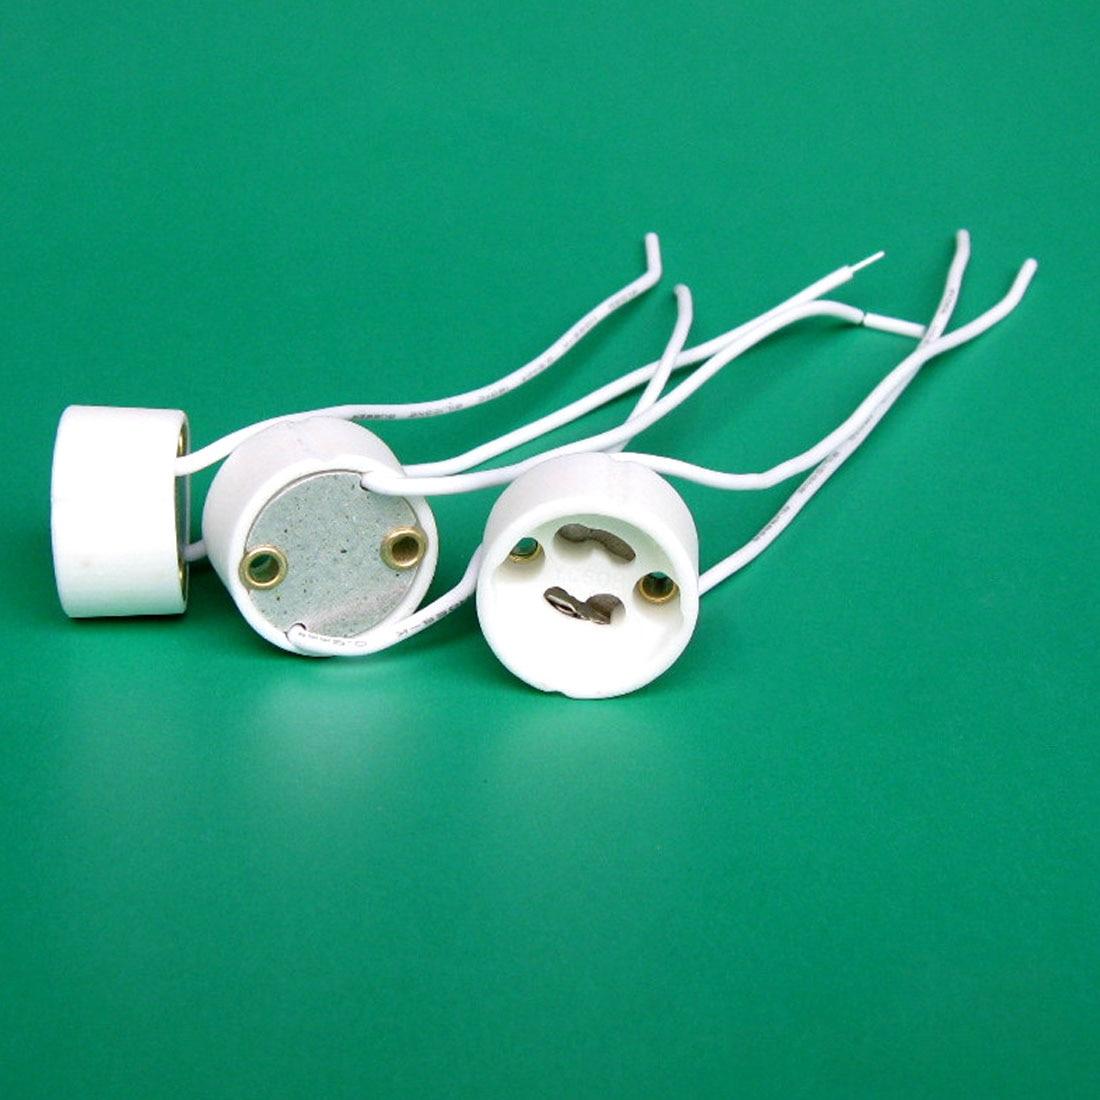 New Brand 10PCS LED Strip Connector GU10 Socket For Halogen Ceramic Light Bulb Lamps Holder Base Wire Connector Lamp Holder